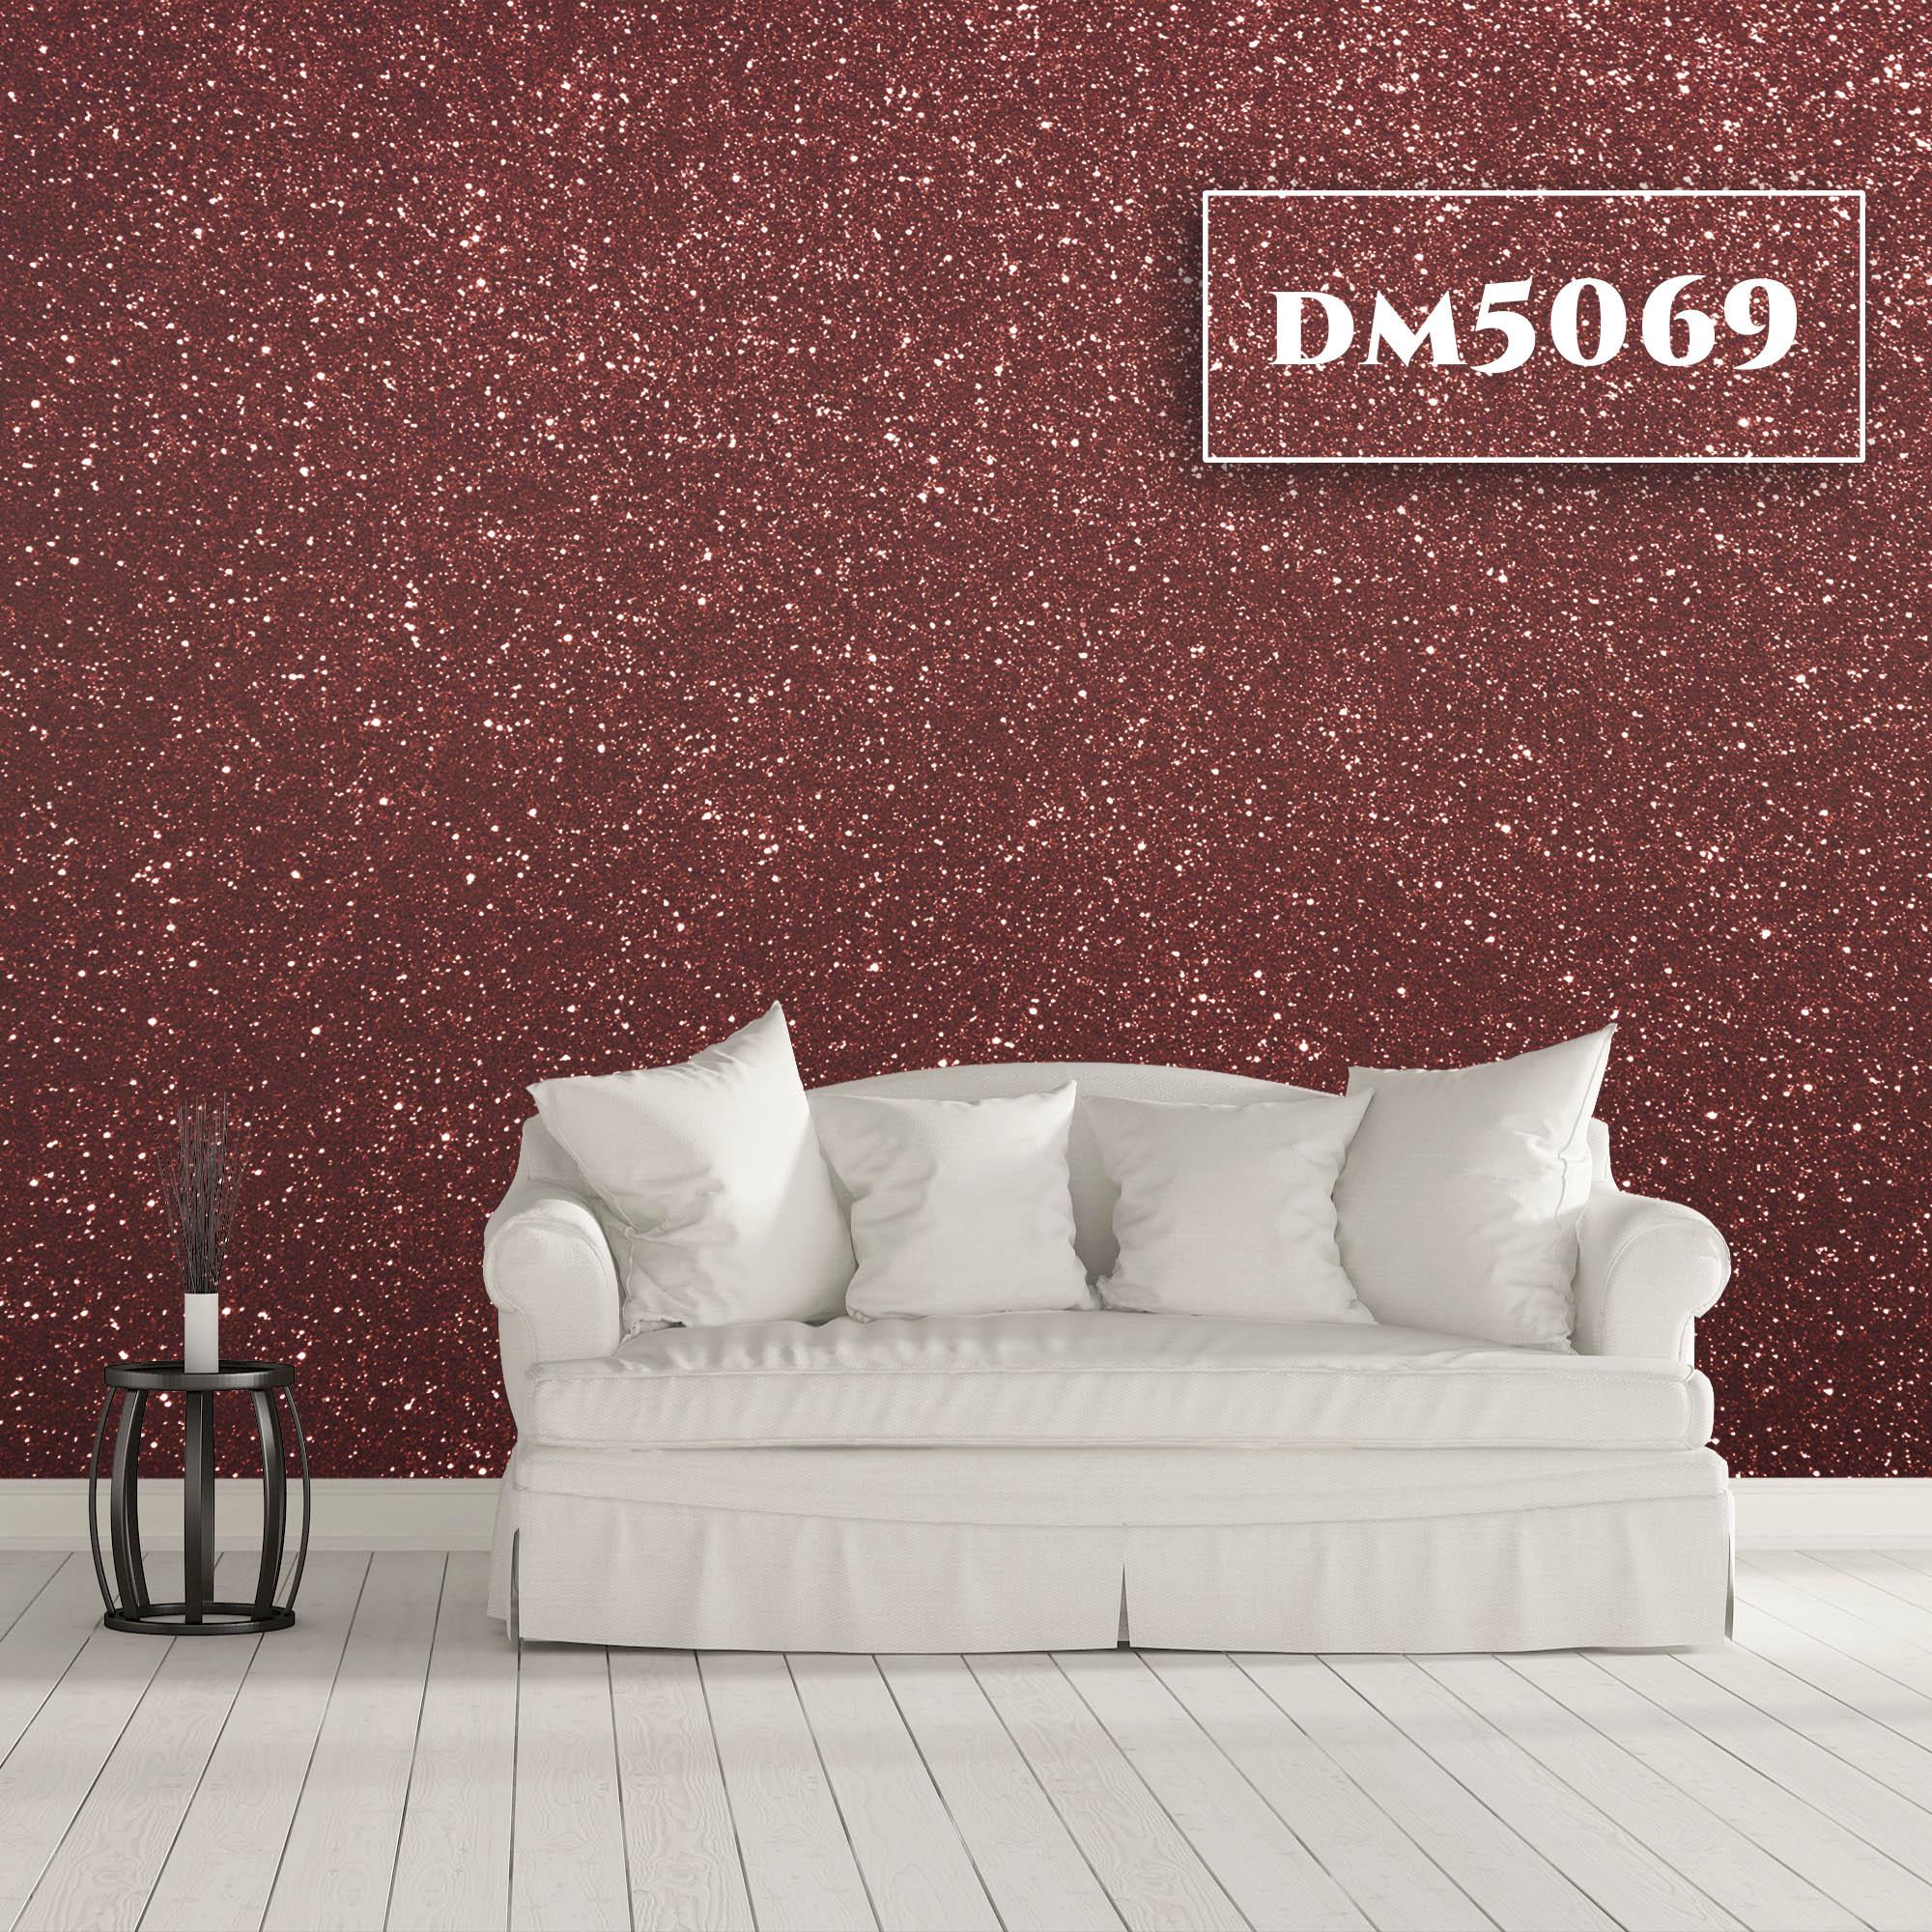 DM5069